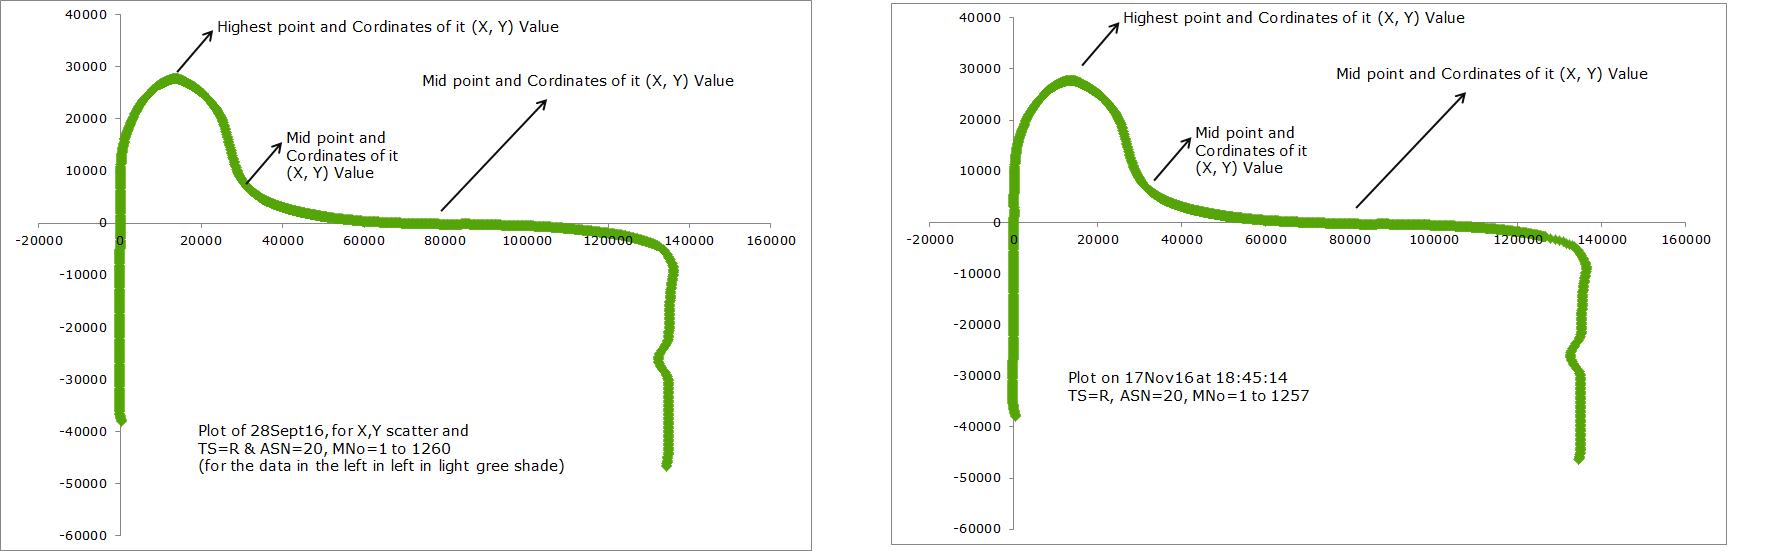 sample plots